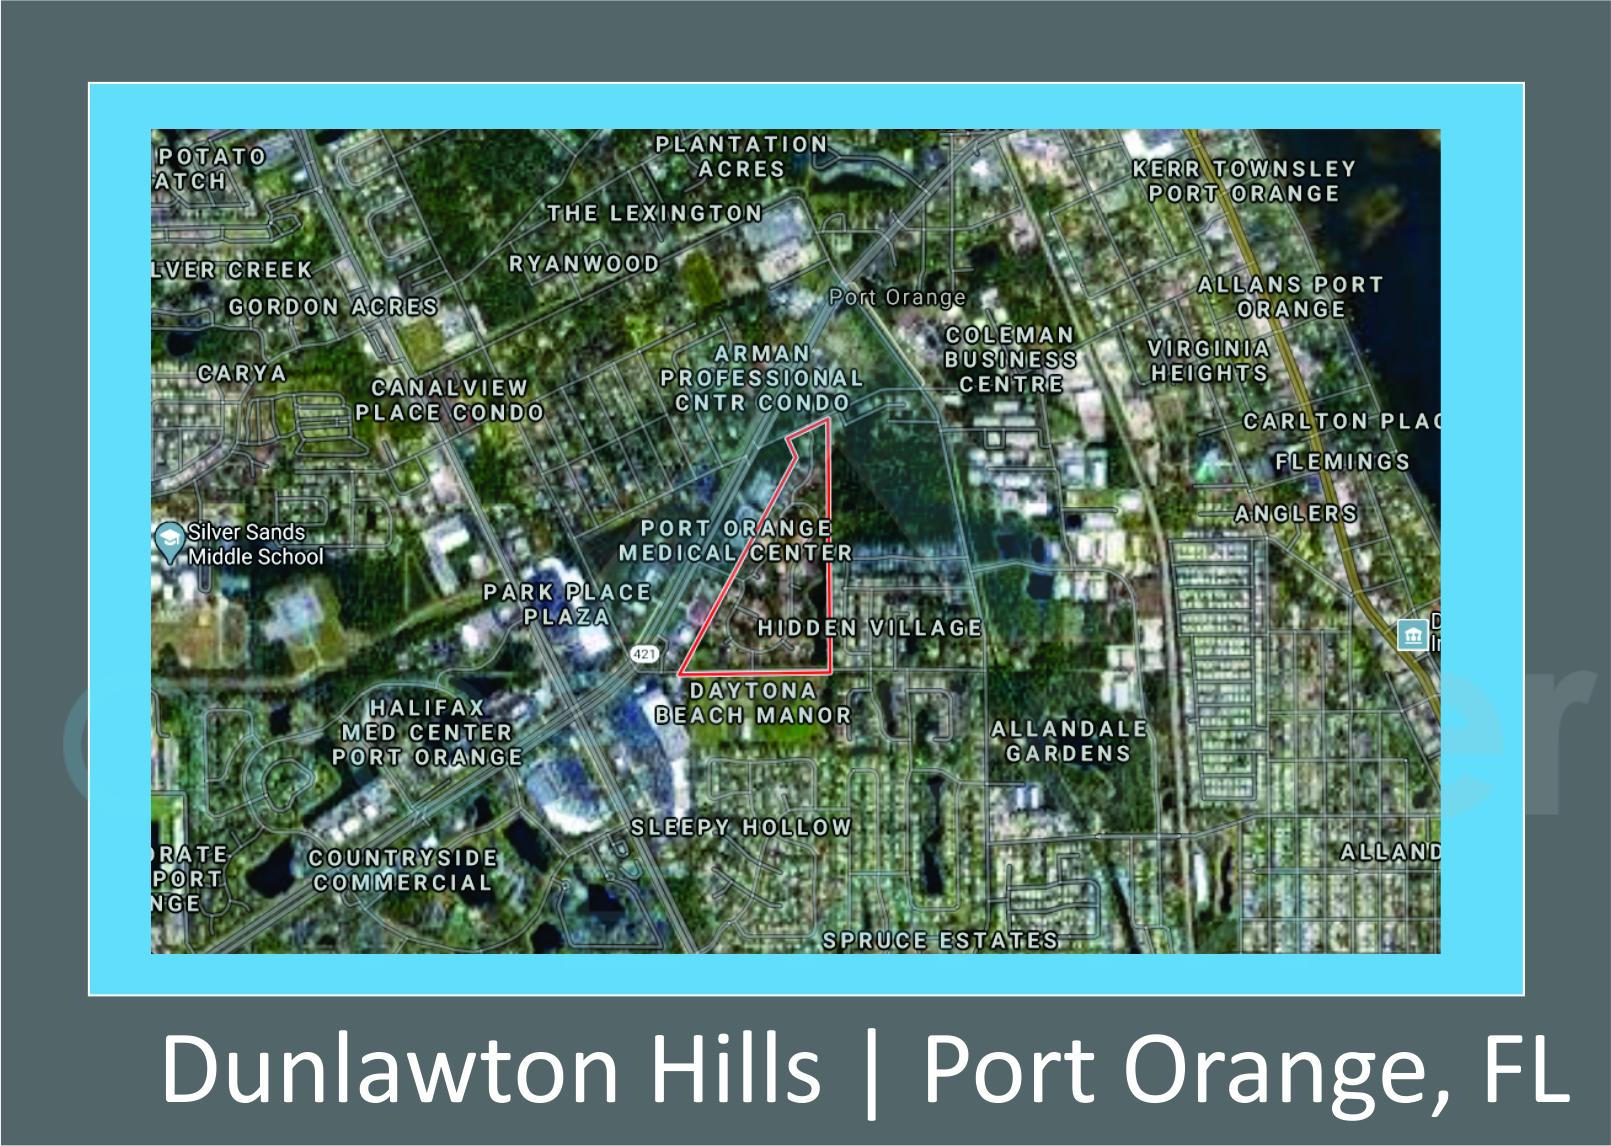 Map of Dunlawton Hills Port Orange, FL